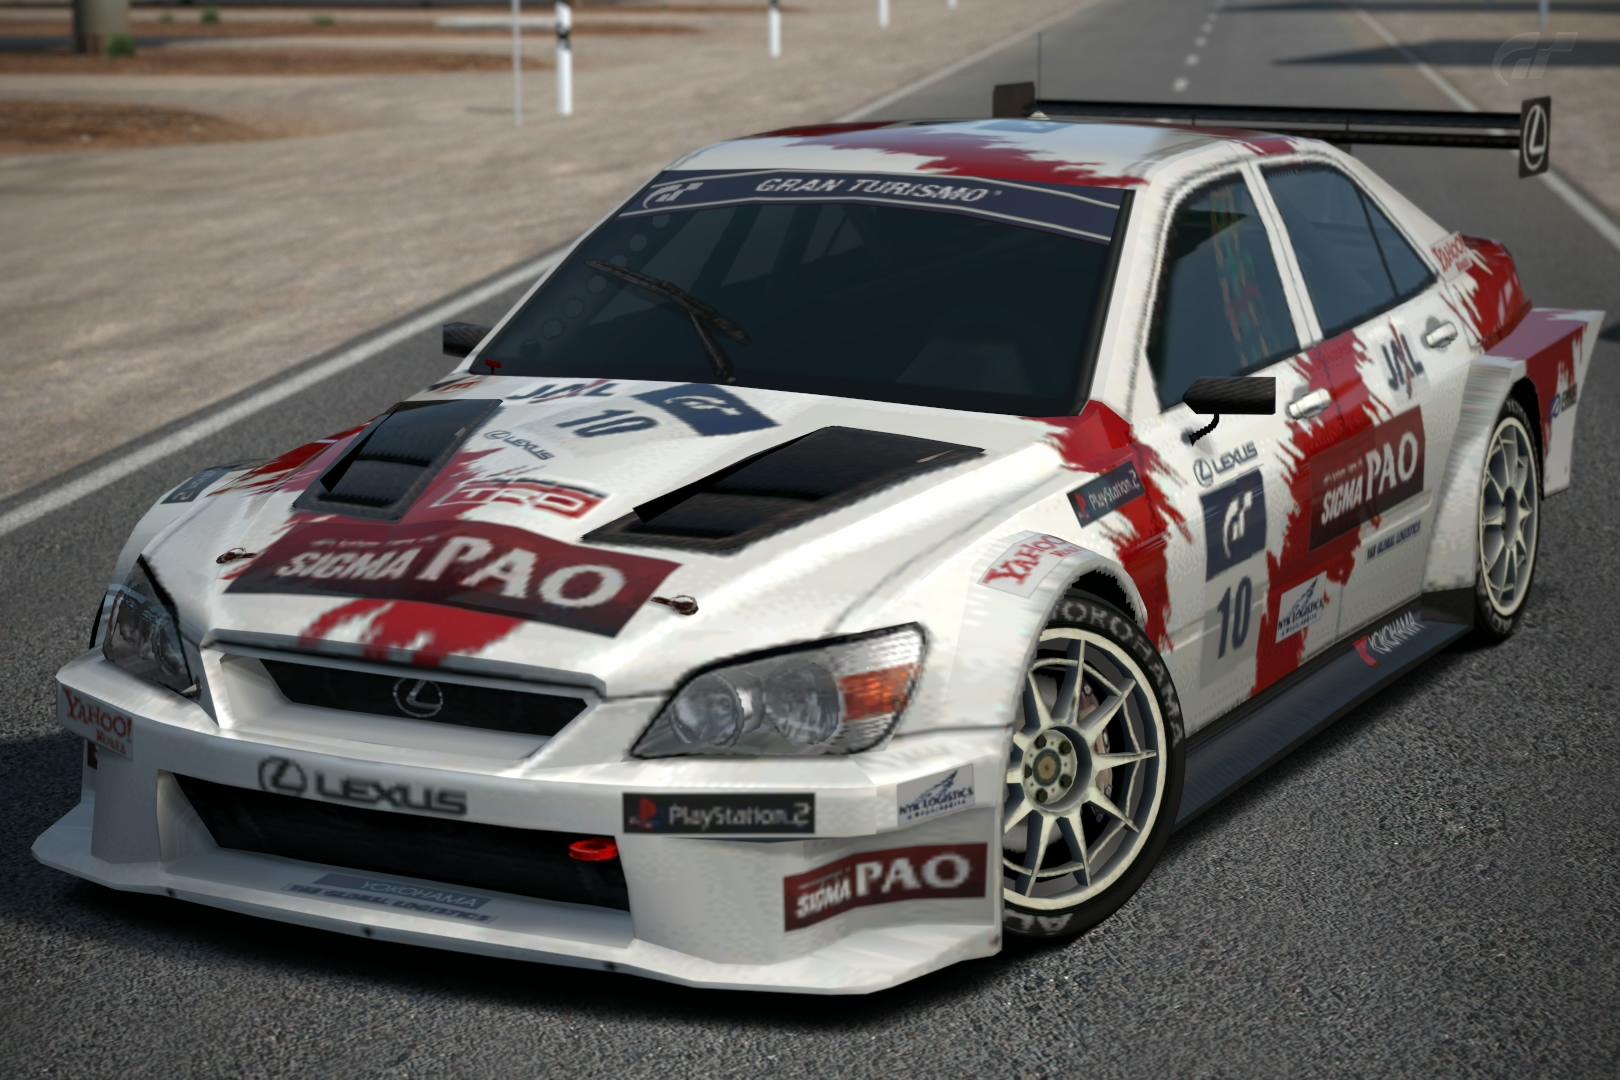 lexus is 200 gt 1 race car 39 04 gran turismo wiki fandom powered by wikia. Black Bedroom Furniture Sets. Home Design Ideas